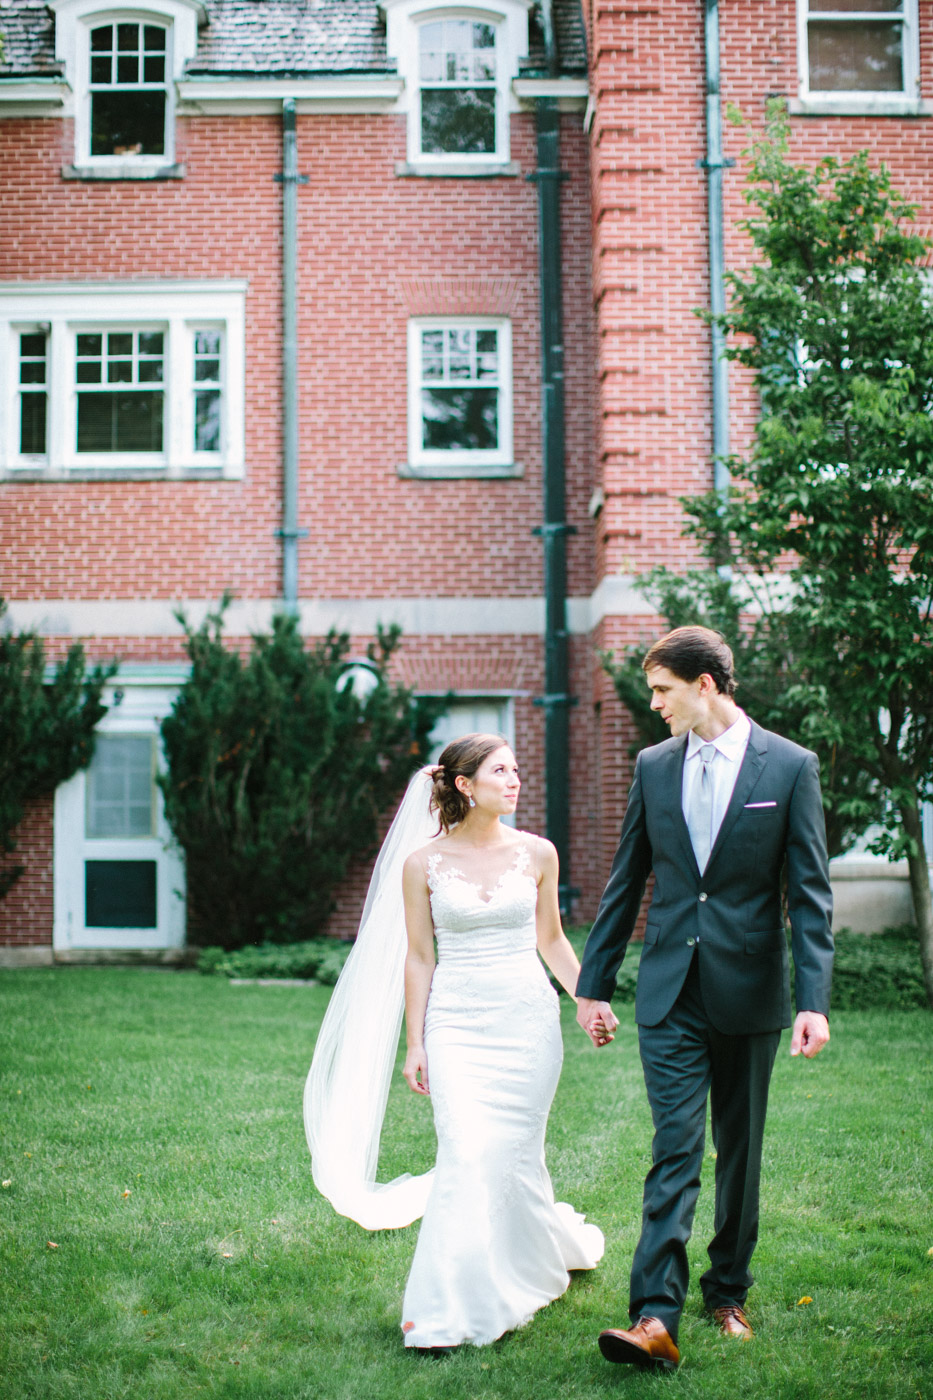 Kelly & Ben Wedding Web 2016-422.jpg